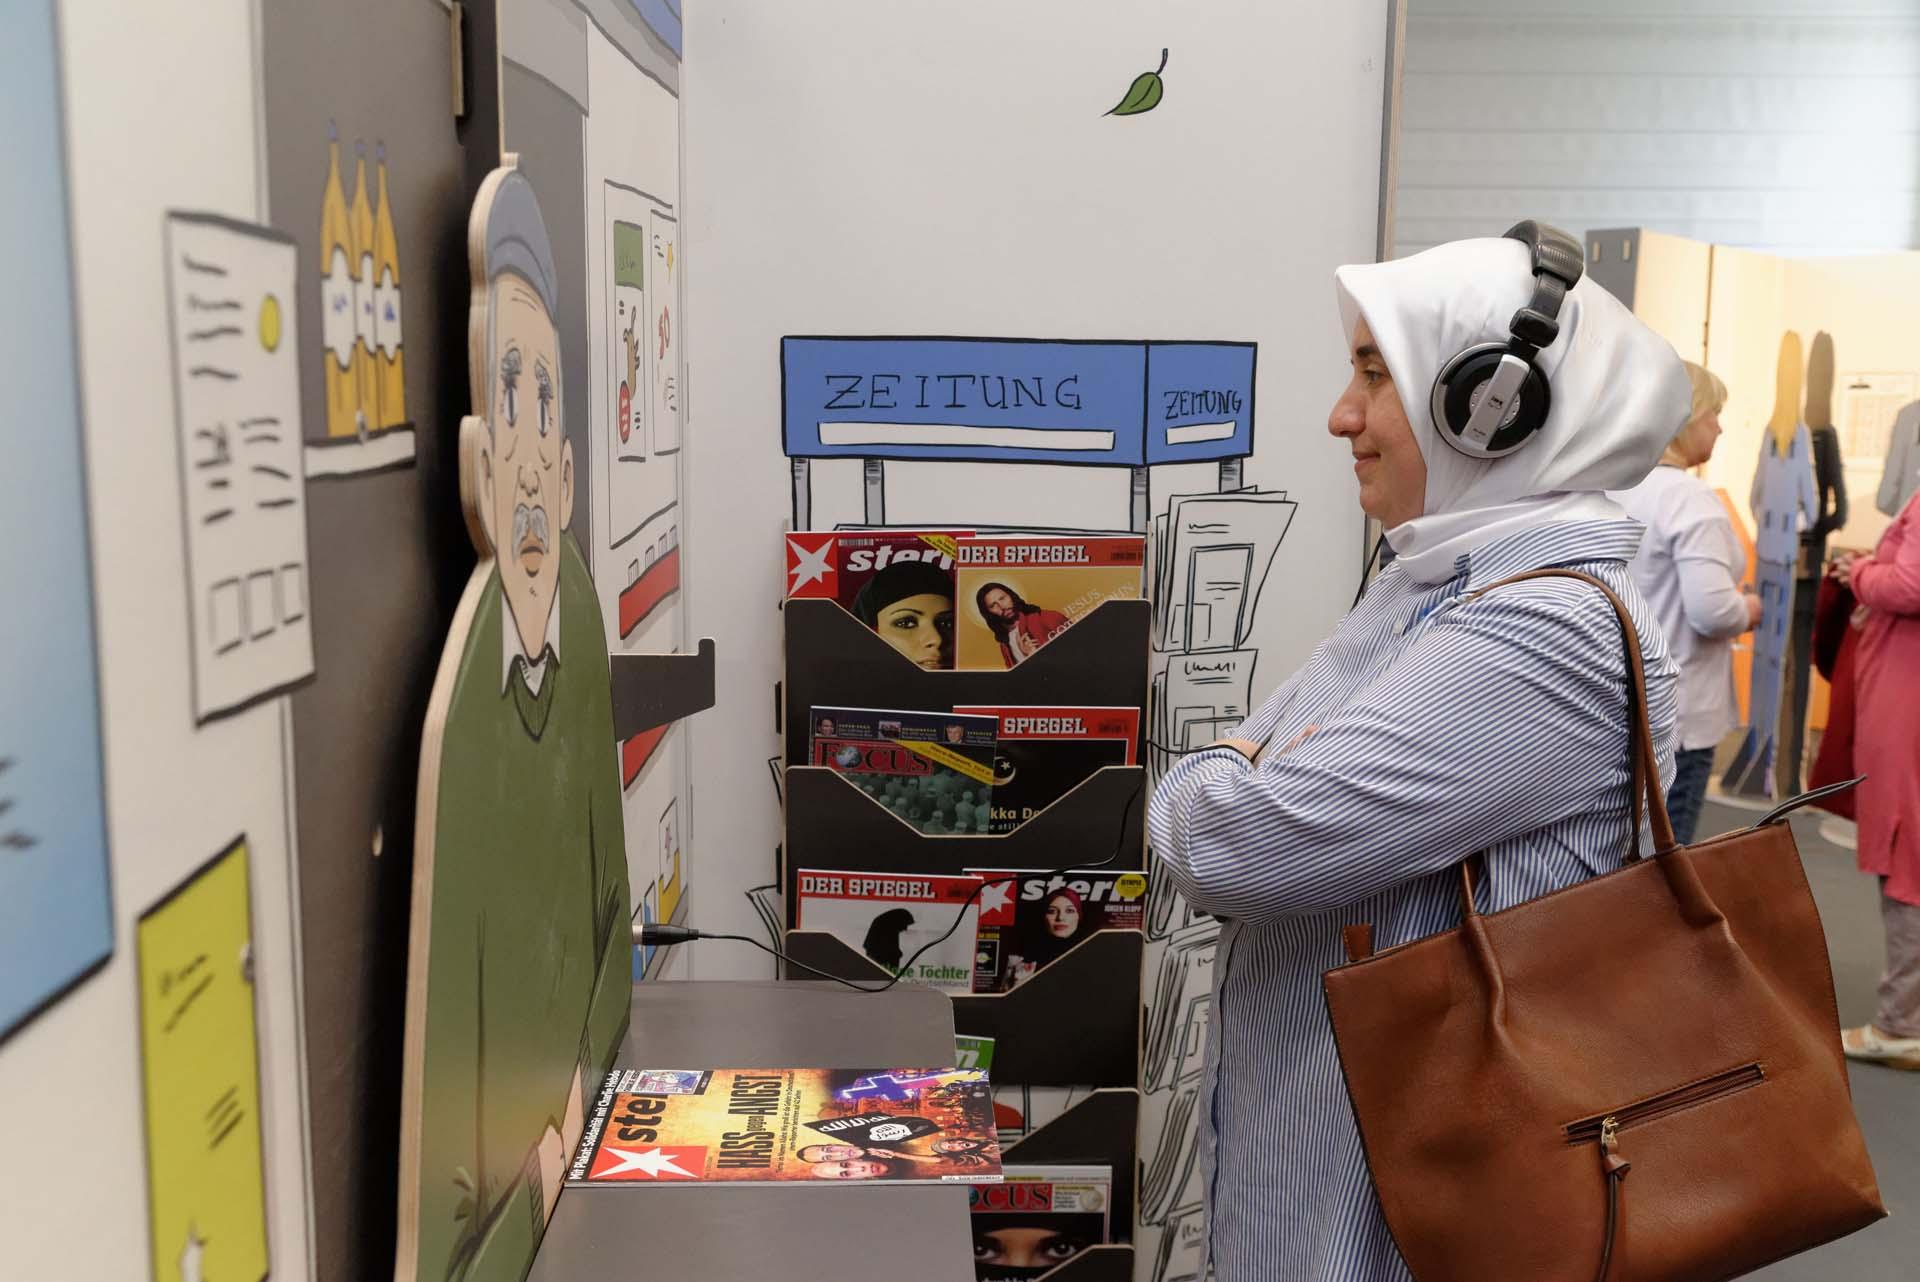 Zuhörende Person am Kiosk